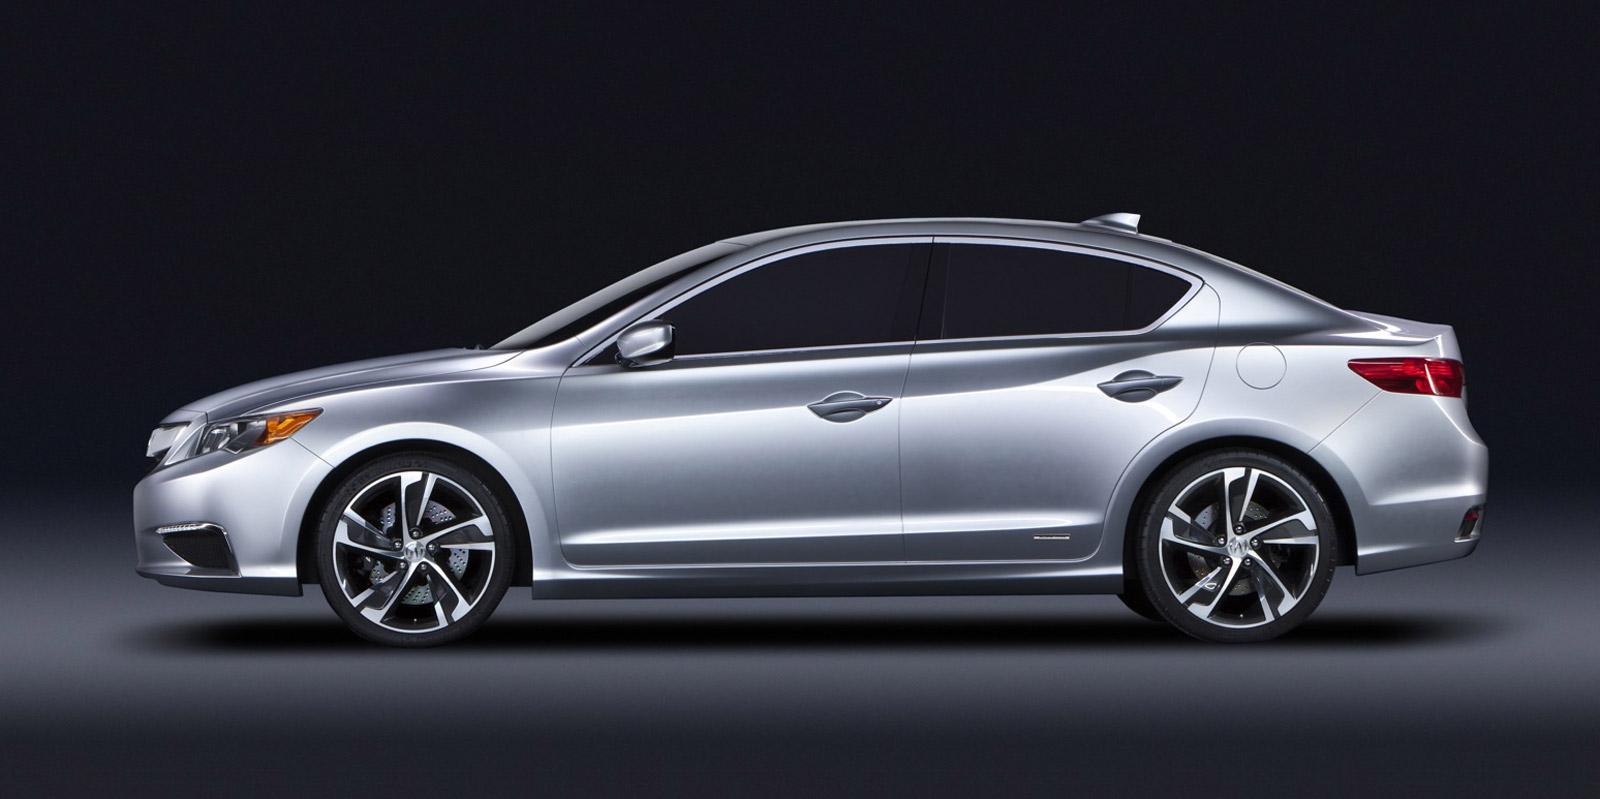 2013 Acura ILX Preview: 2012 Detroit Auto Show